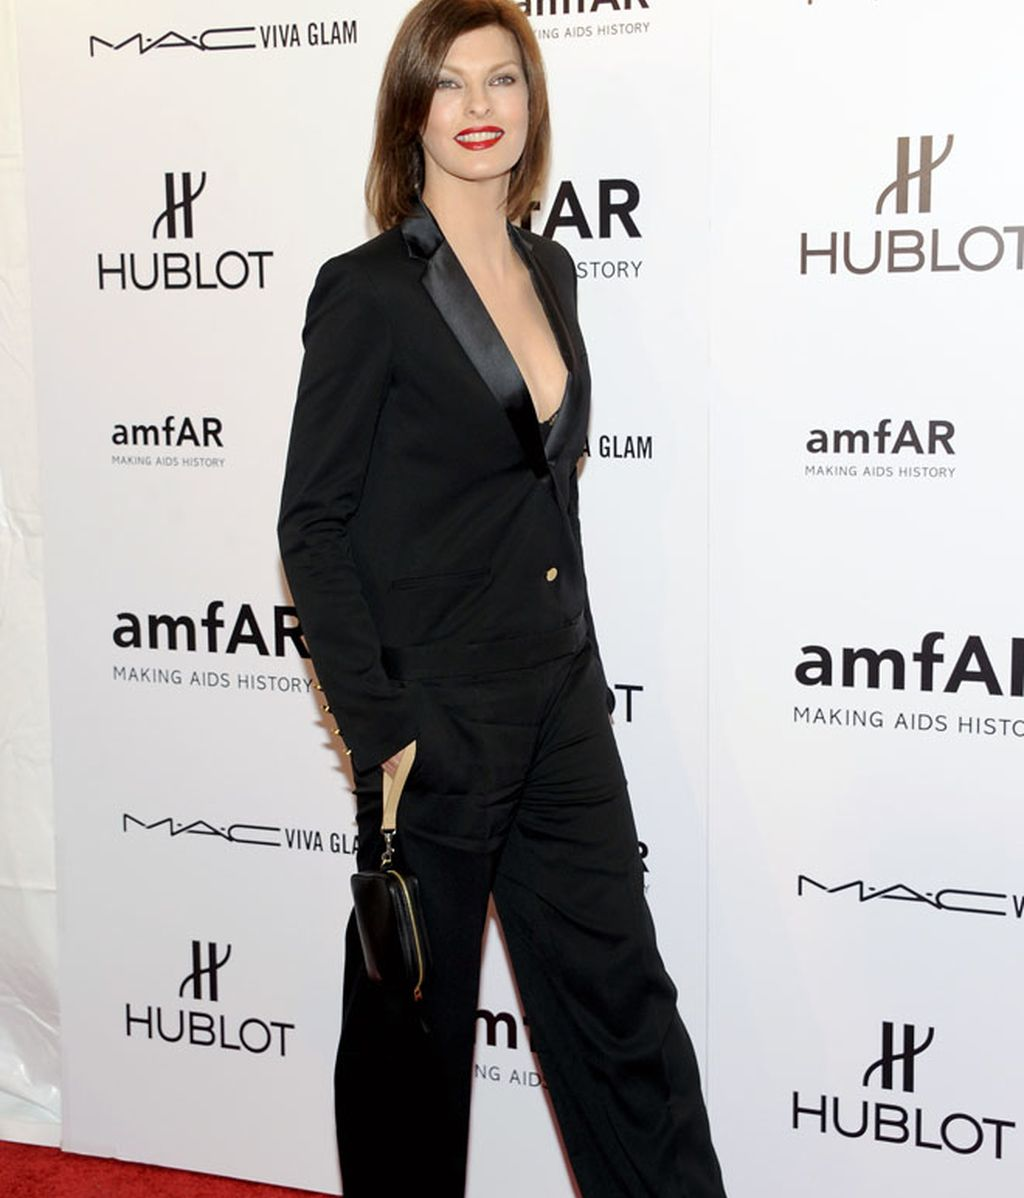 Sarah Jessica, un cuadro; Lindsay, bien vestida, mal operada; Leighton... fail!